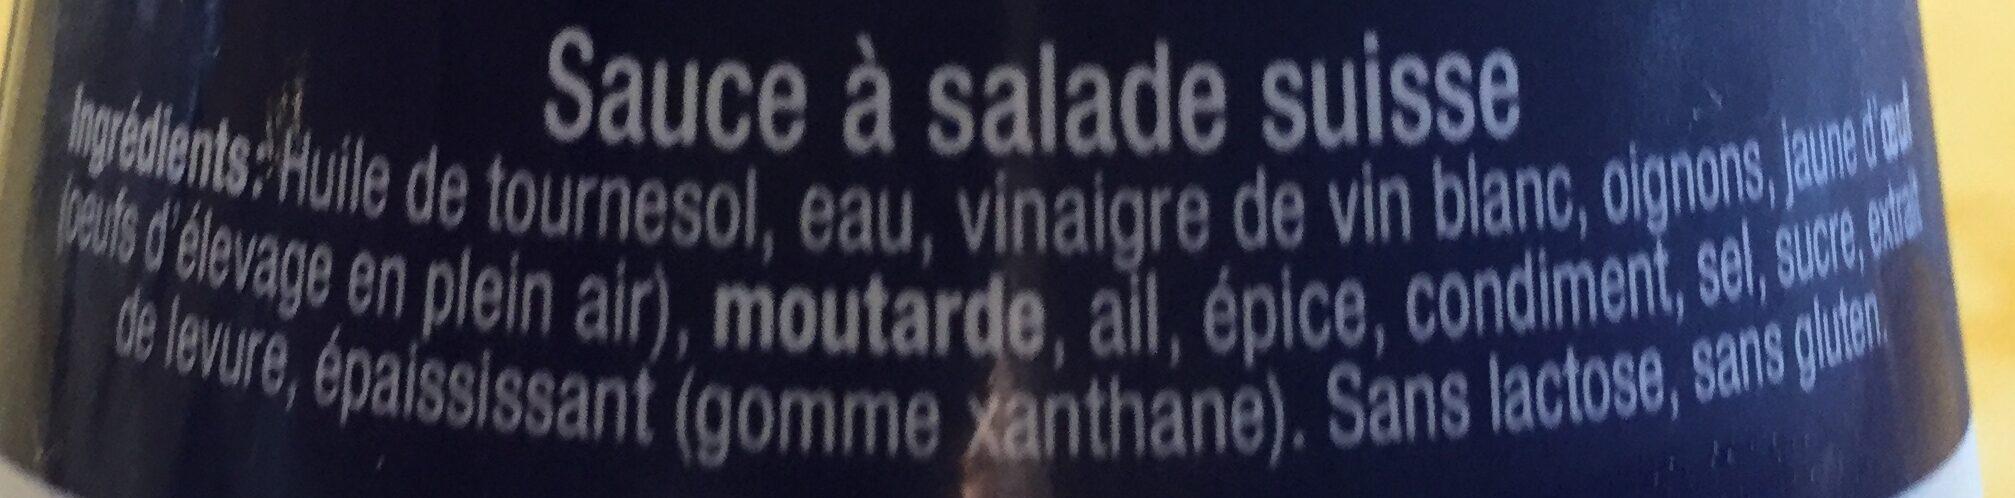 Mövenpick Sauce Salade French 45CL - Ingrédients - fr